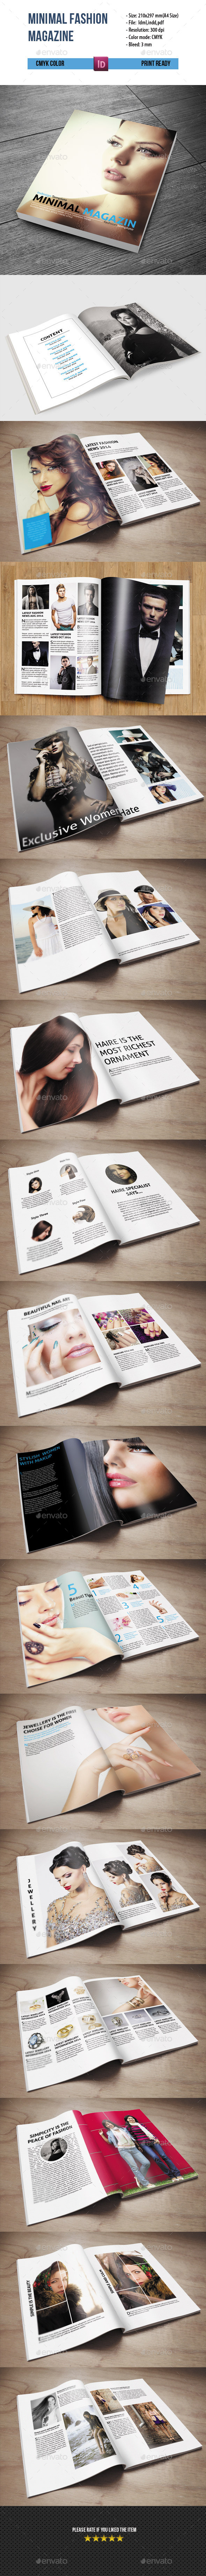 Minimal Fashion Magazine Template-34 Pages - Magazines Print Templates